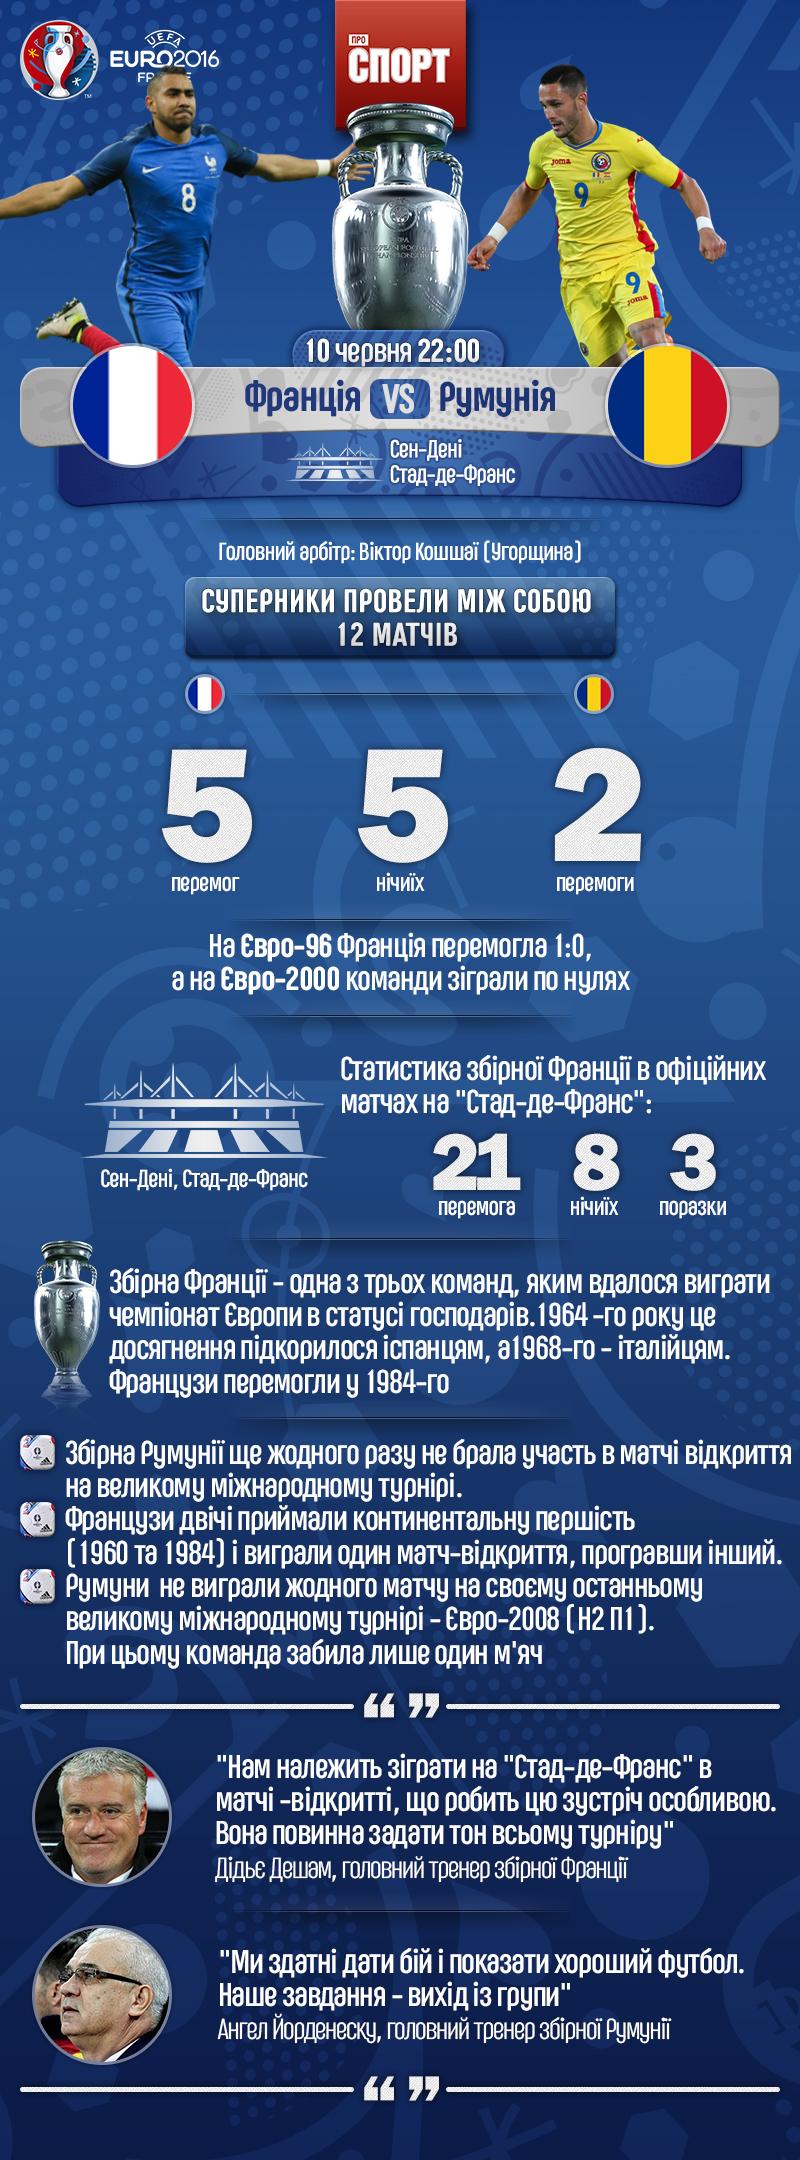 Анонс матчу Франція - Румунія